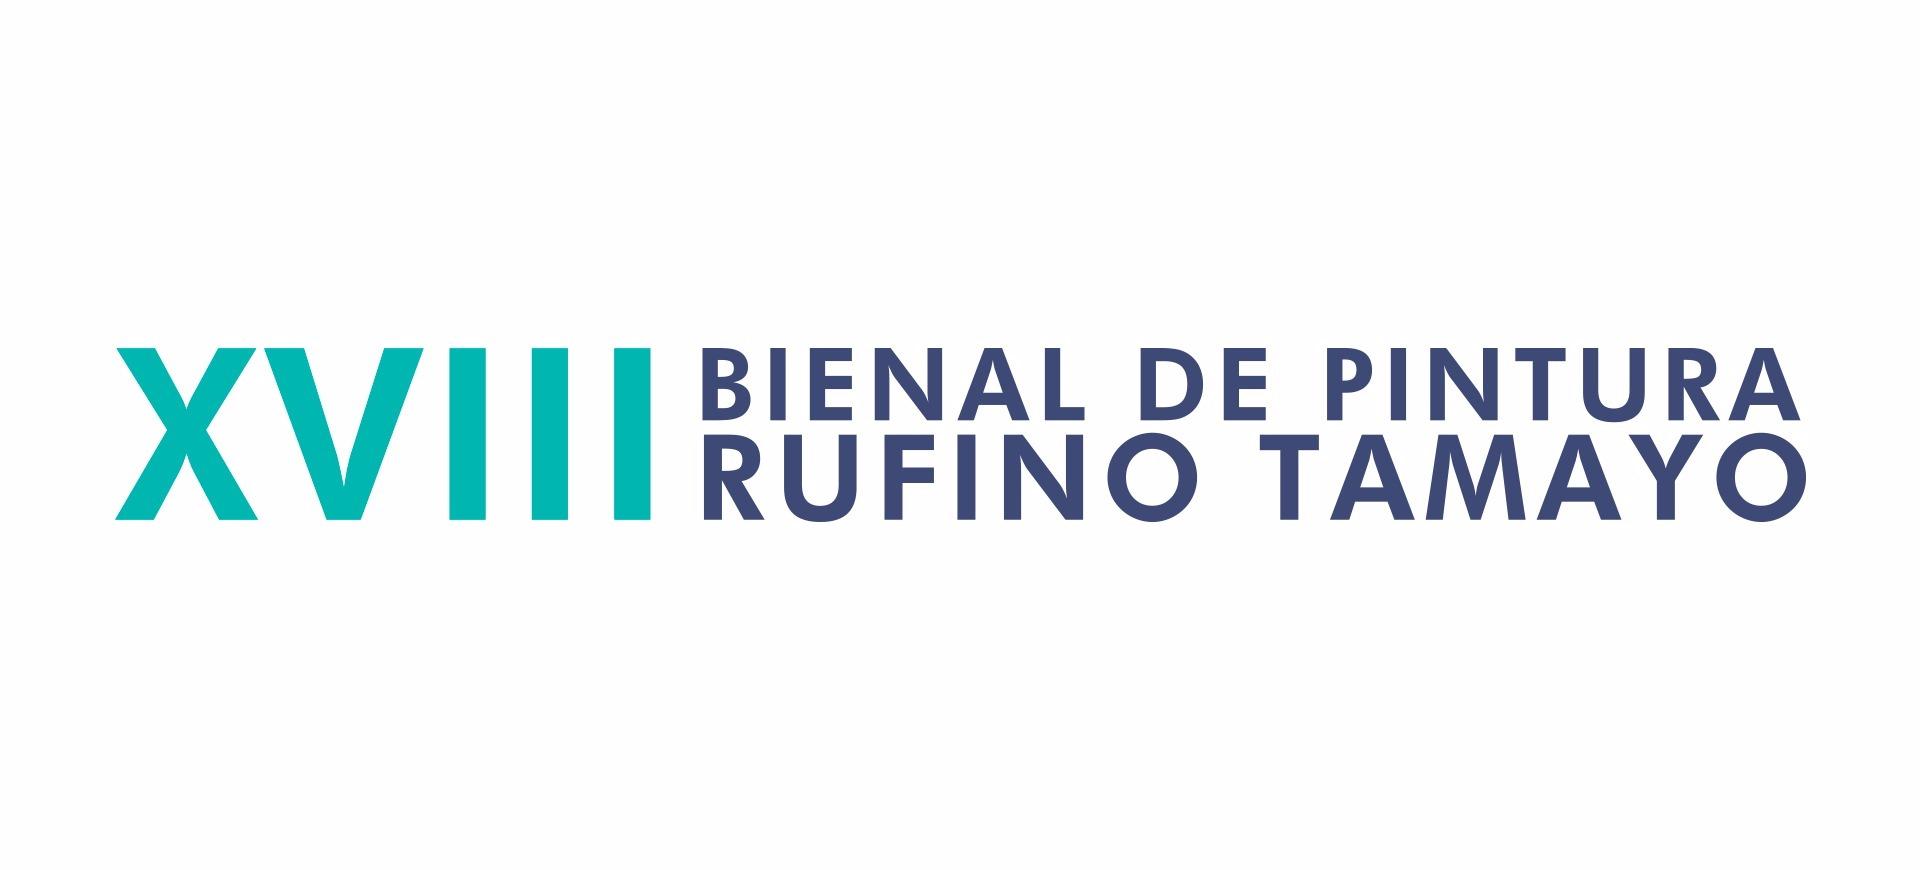 XVIII BIENAL DE PINTURA RUFINO TAMAYO